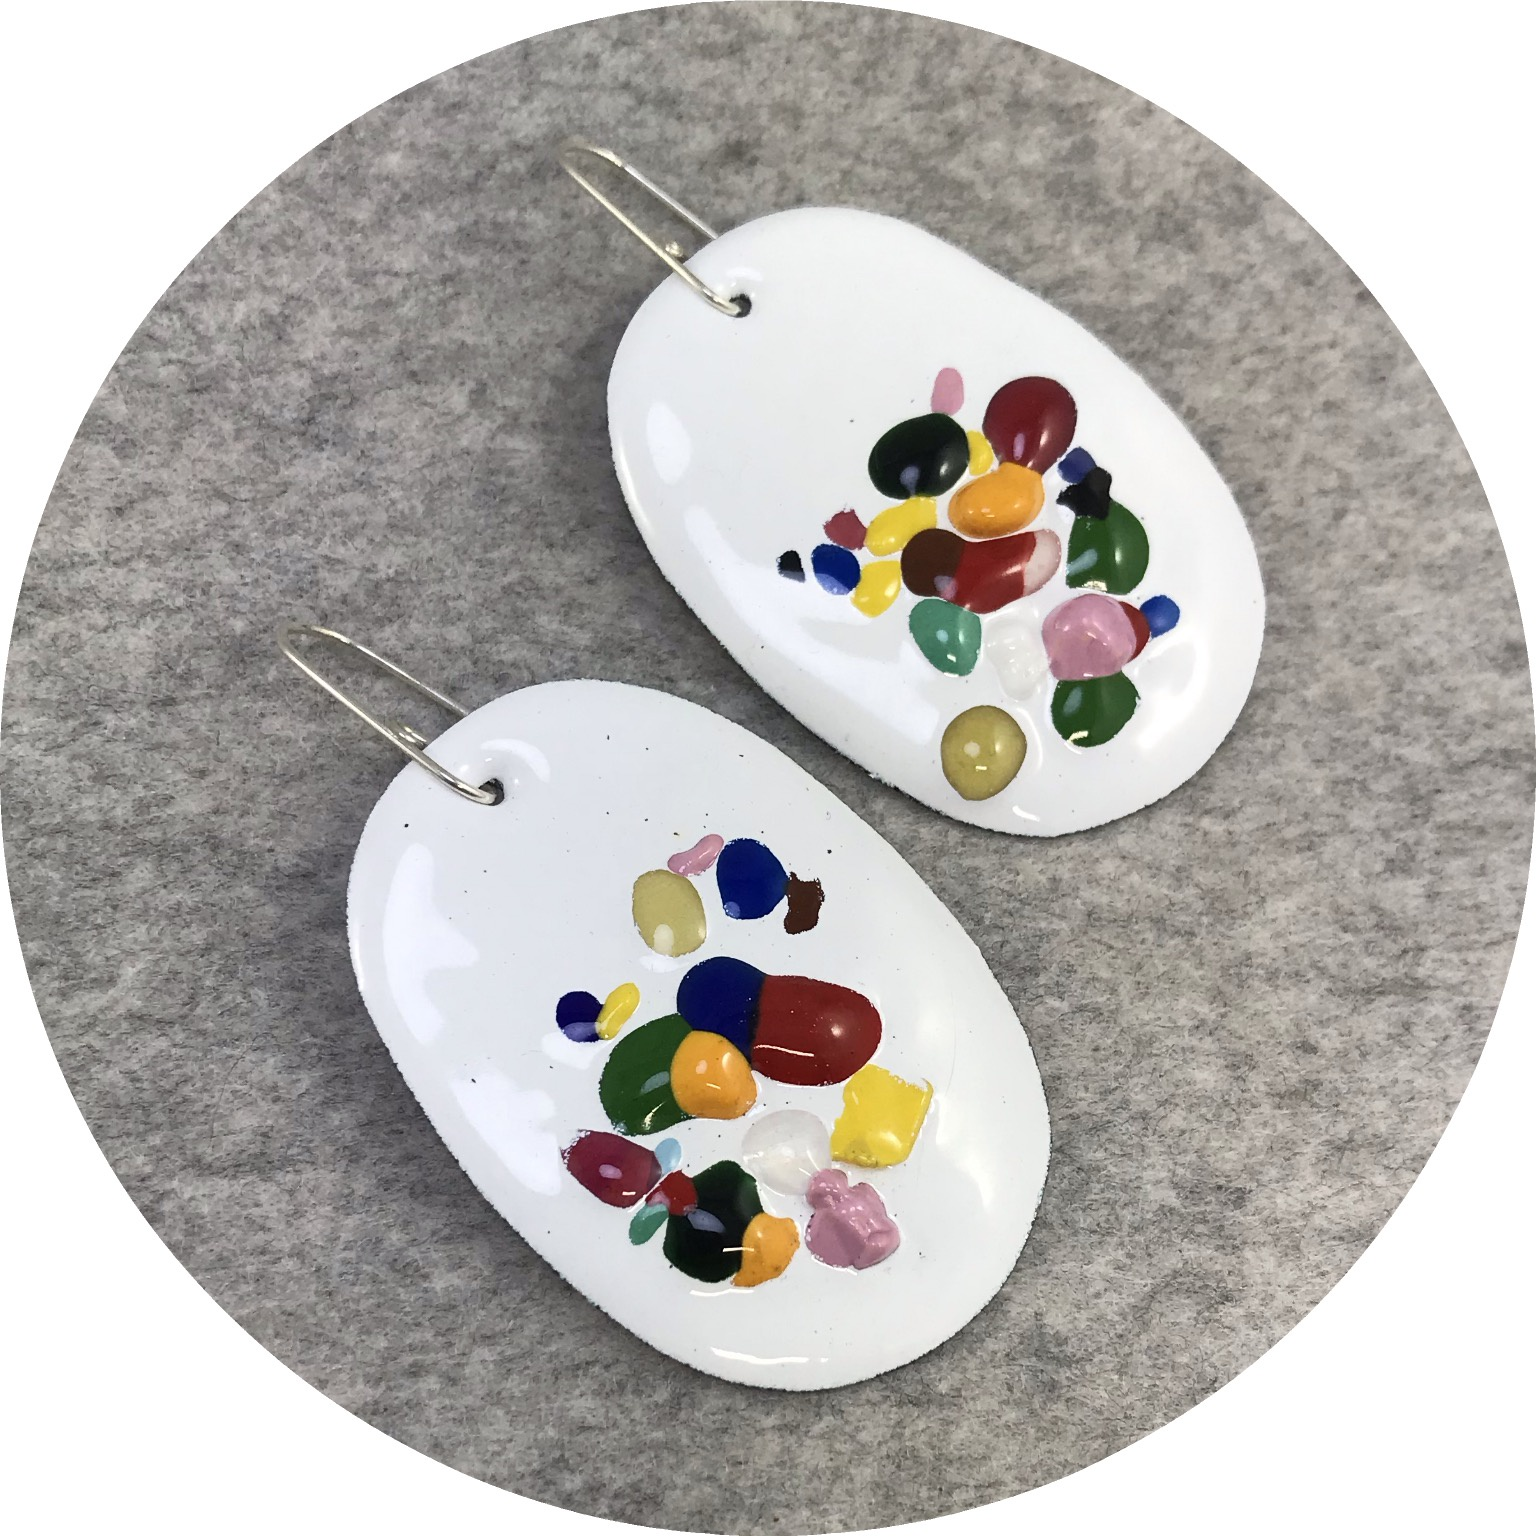 Jenna O'Brien - Medium Earrings in White Enamel with Multi Coloured Flecks